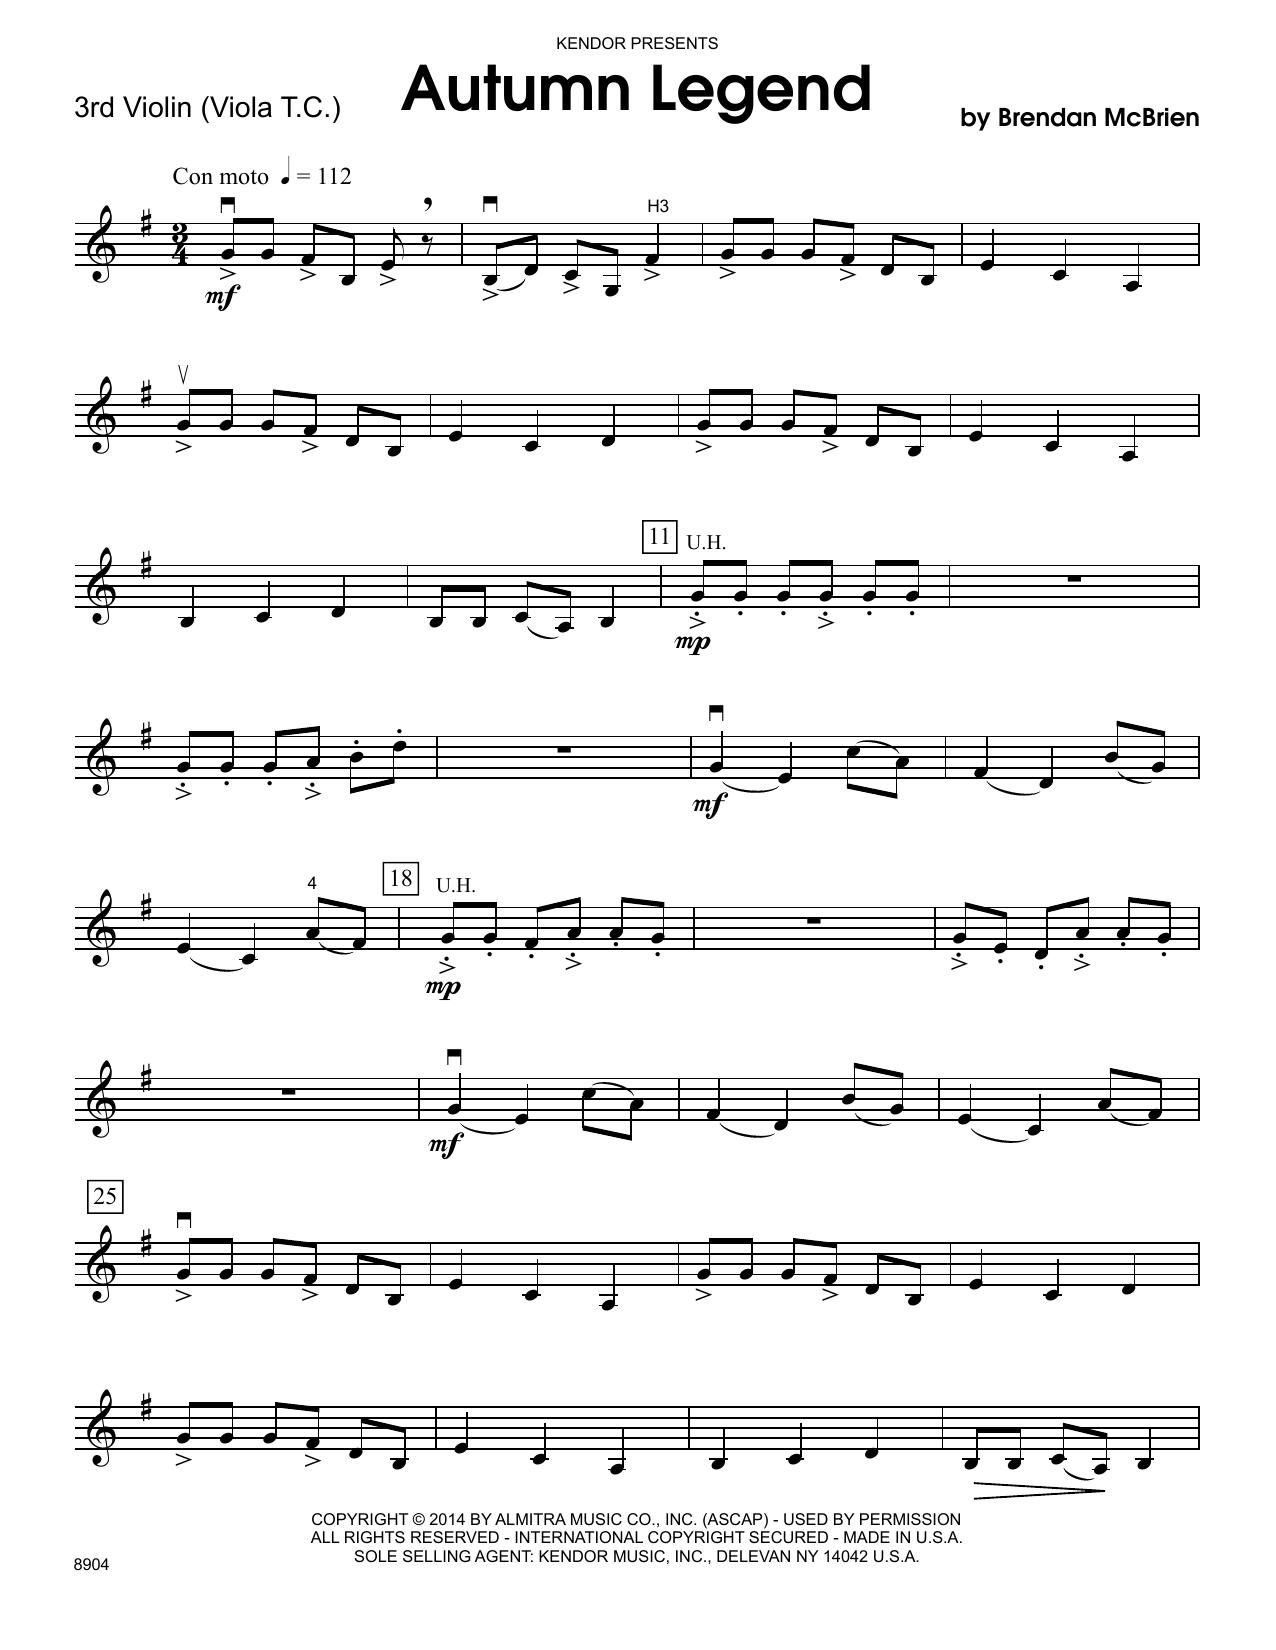 Brendan McBrien Autumn Legend - 3rd Violin sheet music notes and chords. Download Printable PDF.